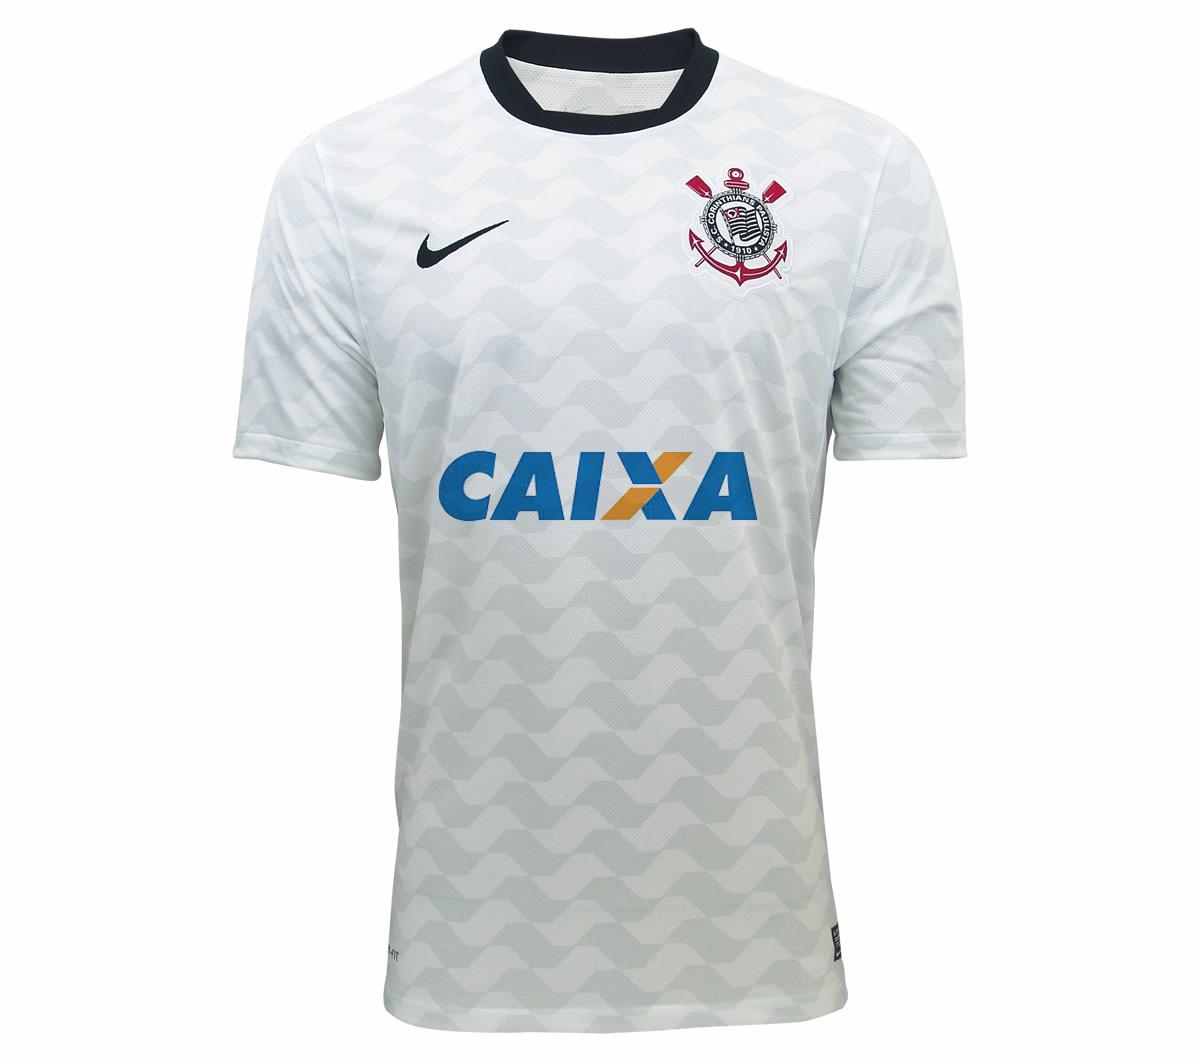 Corinthians_camisa_caixa